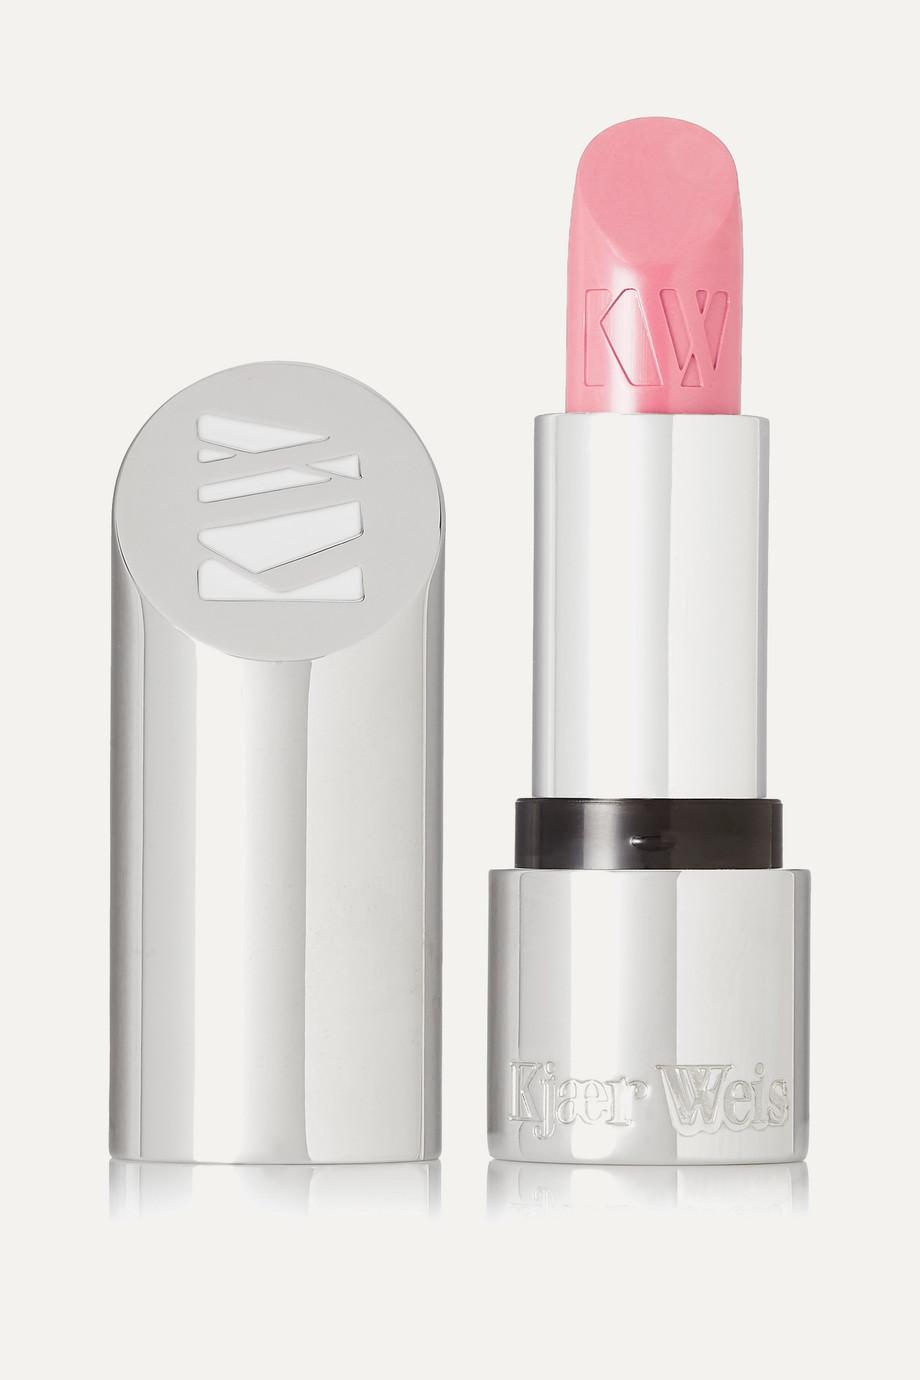 Kjaer Weis Lipstick - Honor